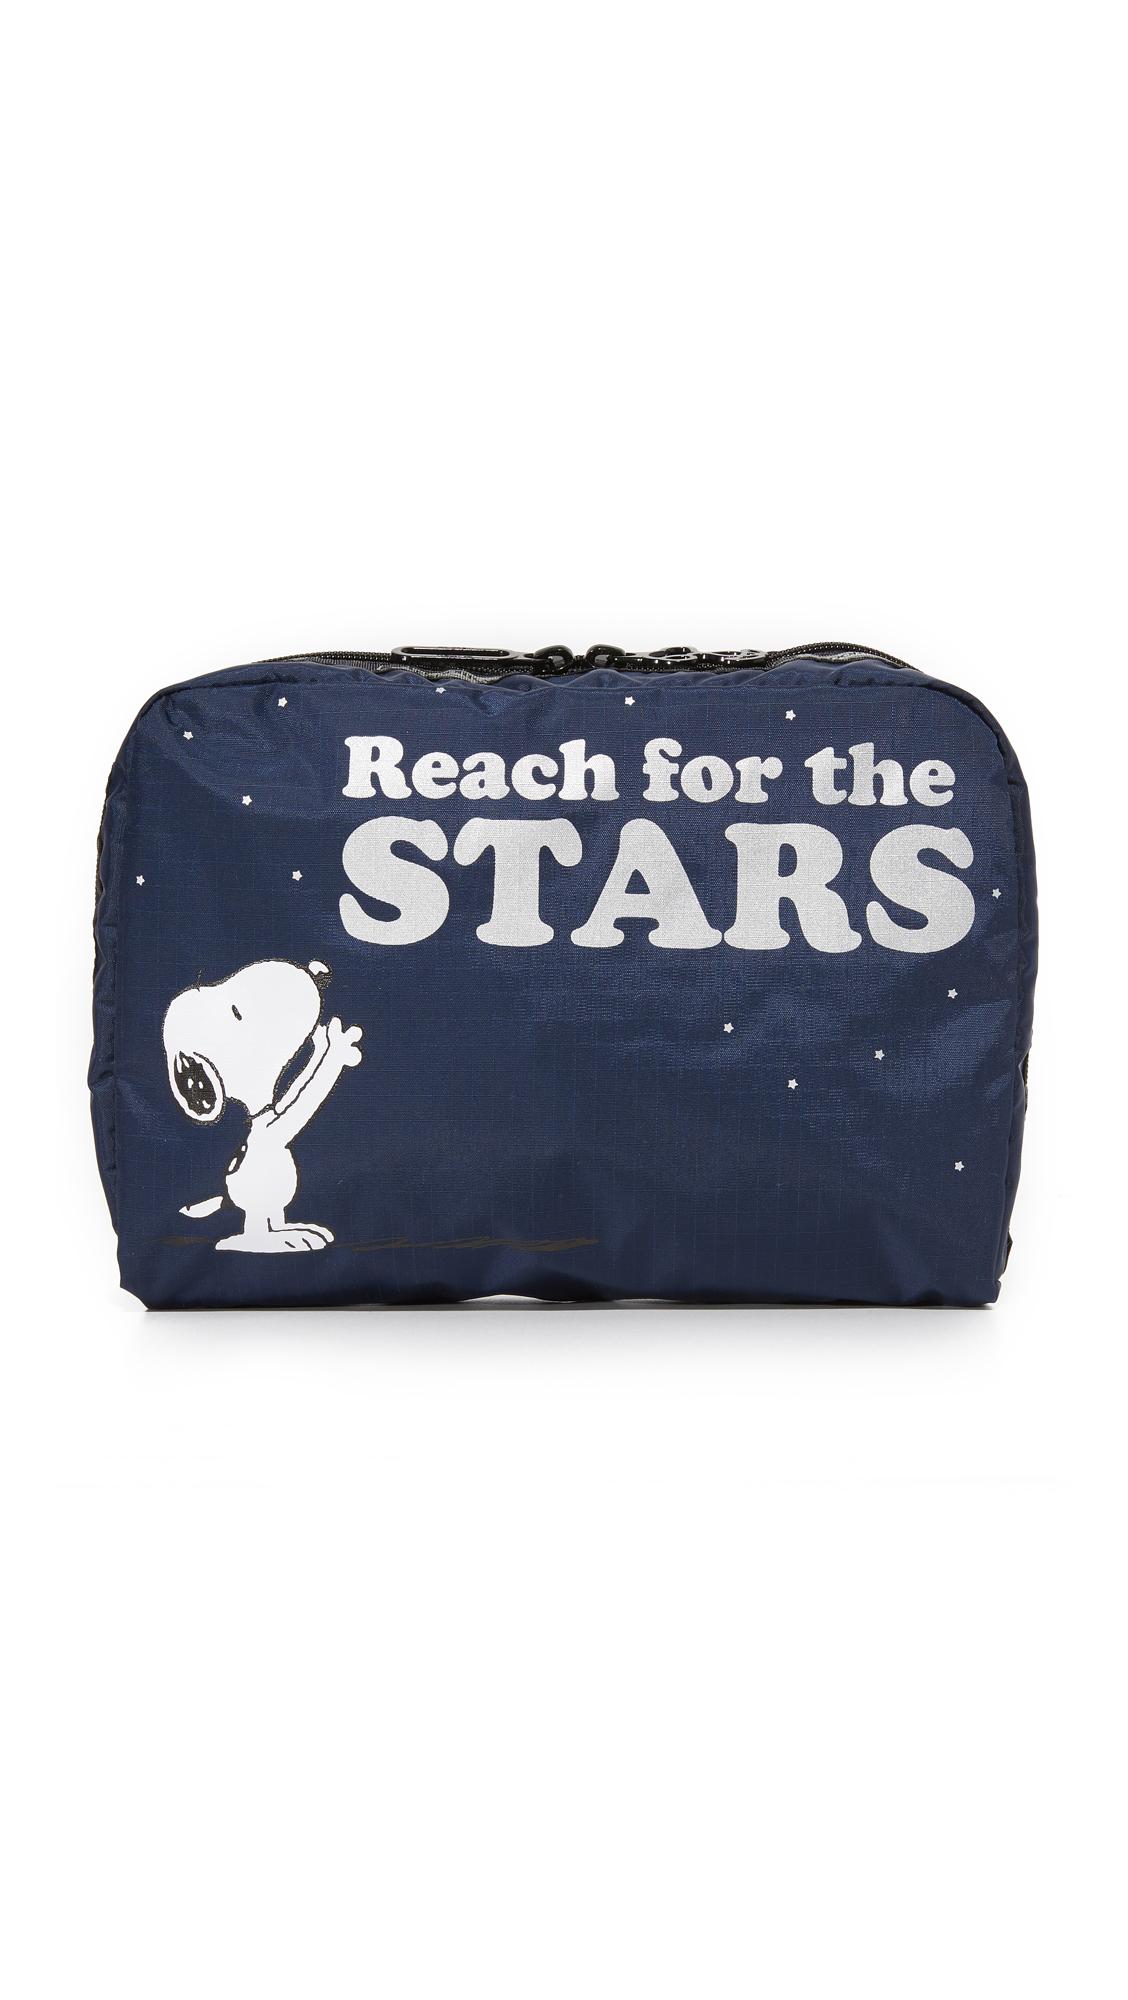 lesportsac female lesportsac peanuts x lesportsac extra large rectangular cosmetic case reach for the stars